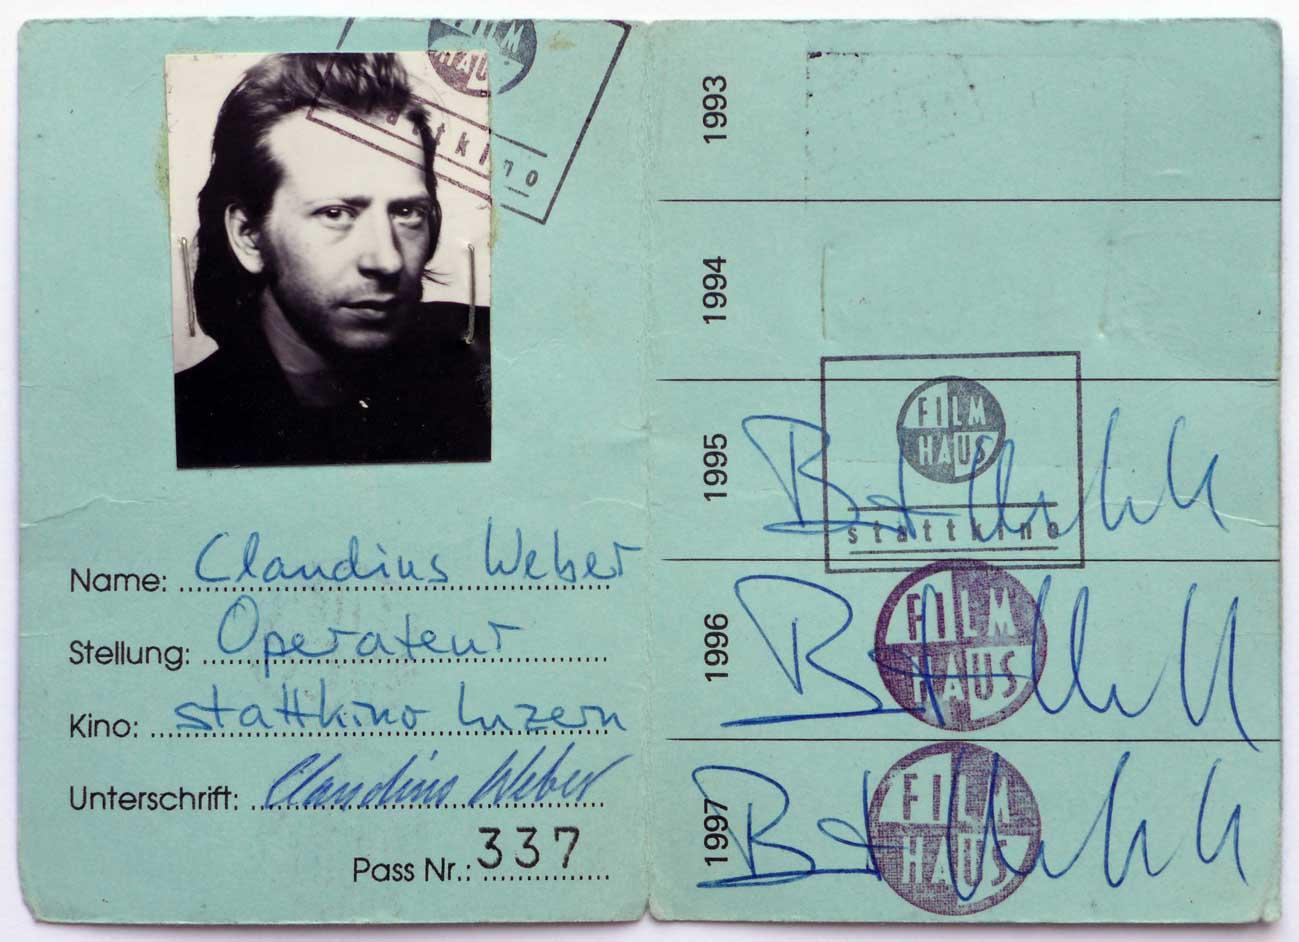 1995. 28